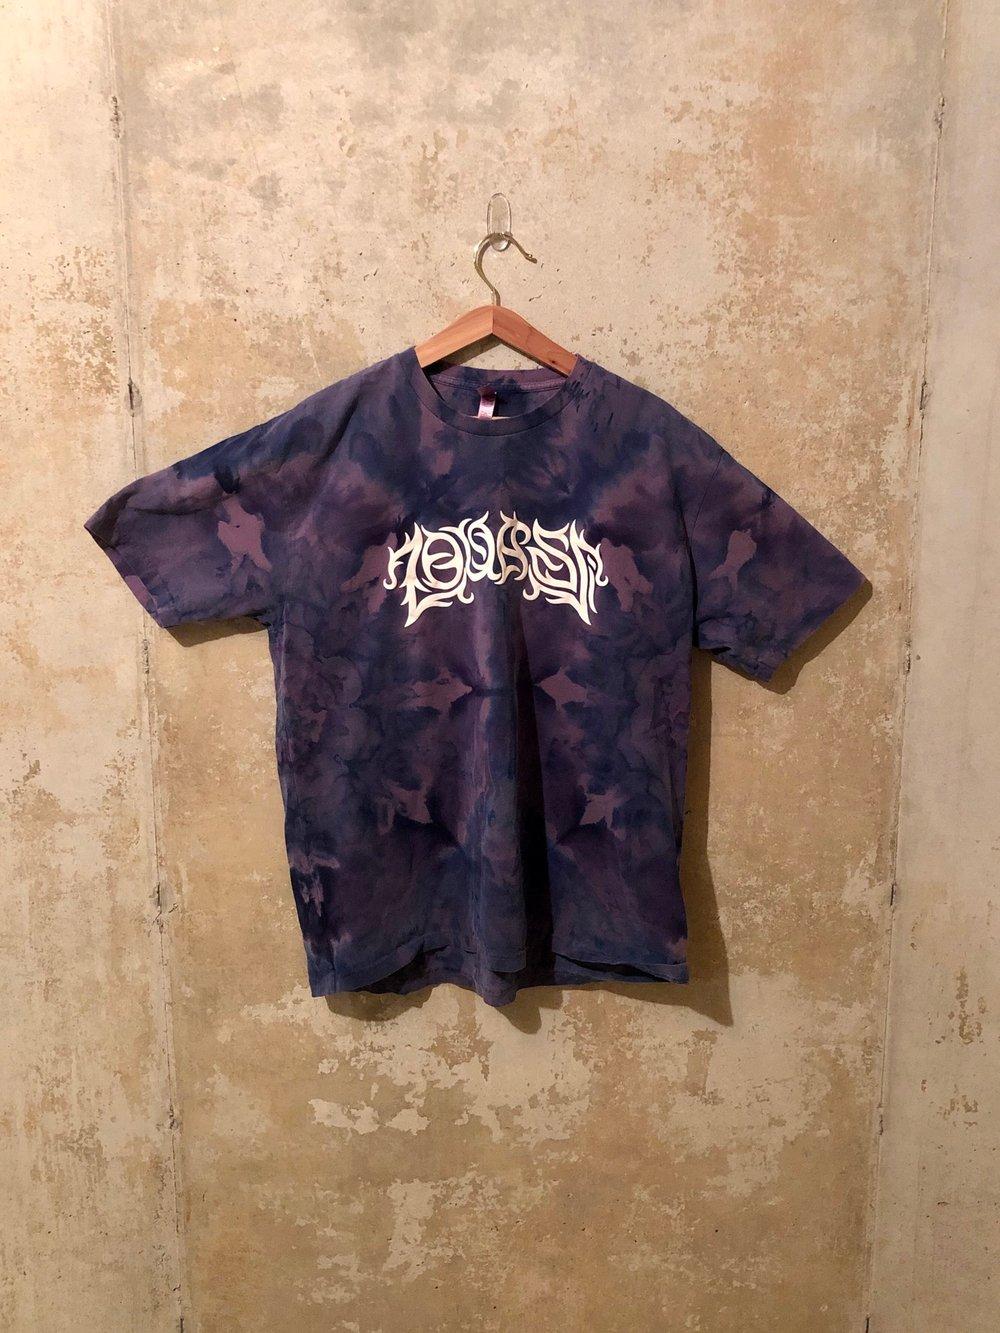 Large Puff Print Tie Dye Shirt #5